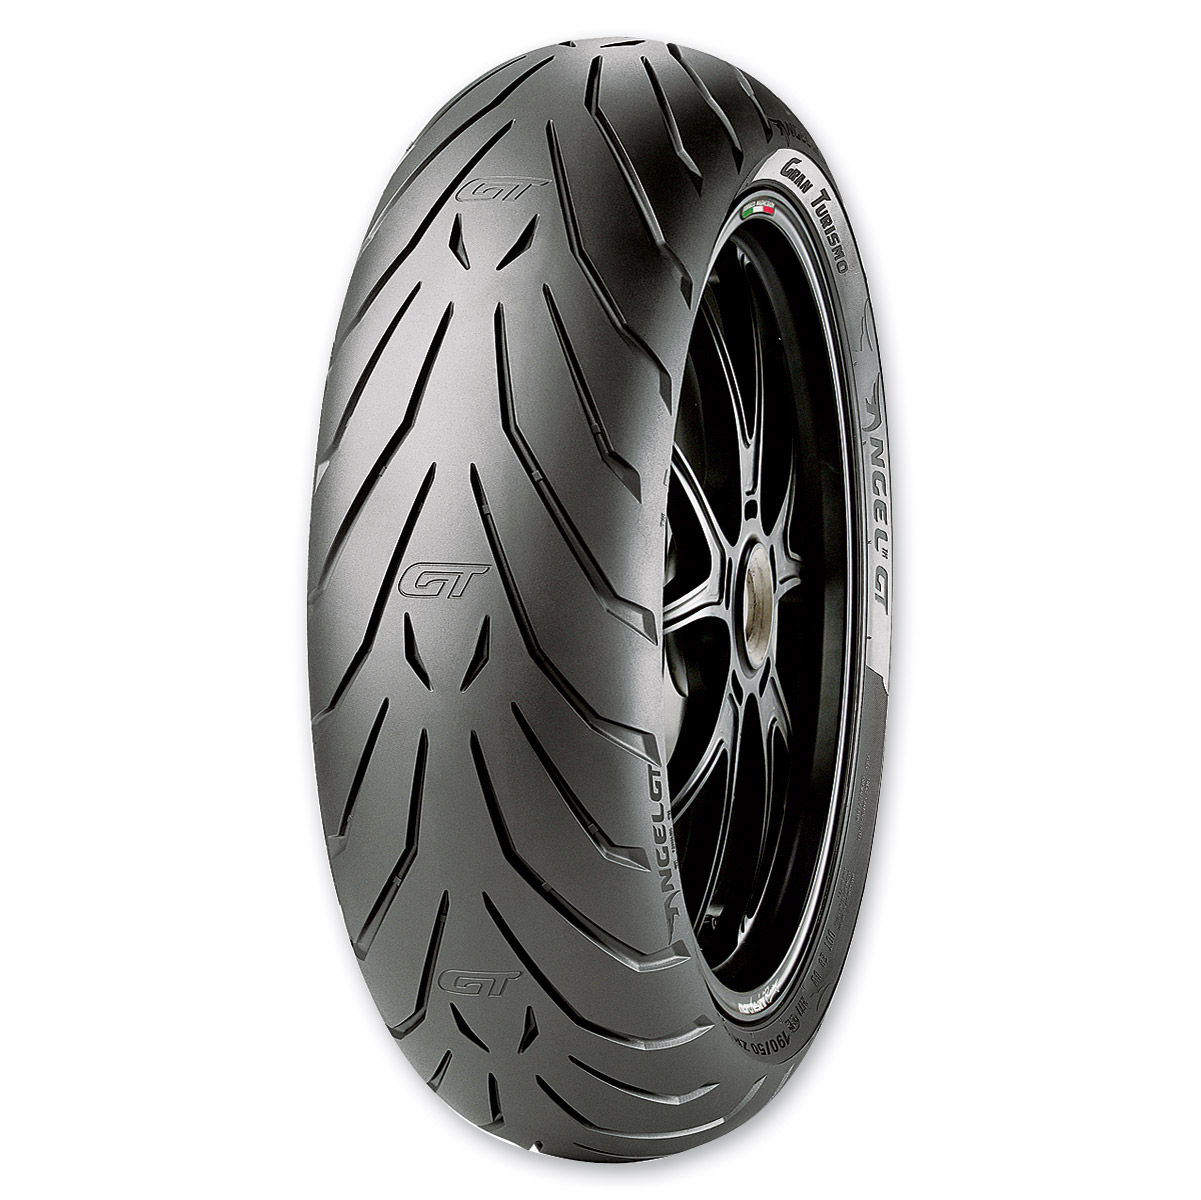 pirelli angel gt 190 55zr 17 rear tire 714 144 j p cycles. Black Bedroom Furniture Sets. Home Design Ideas